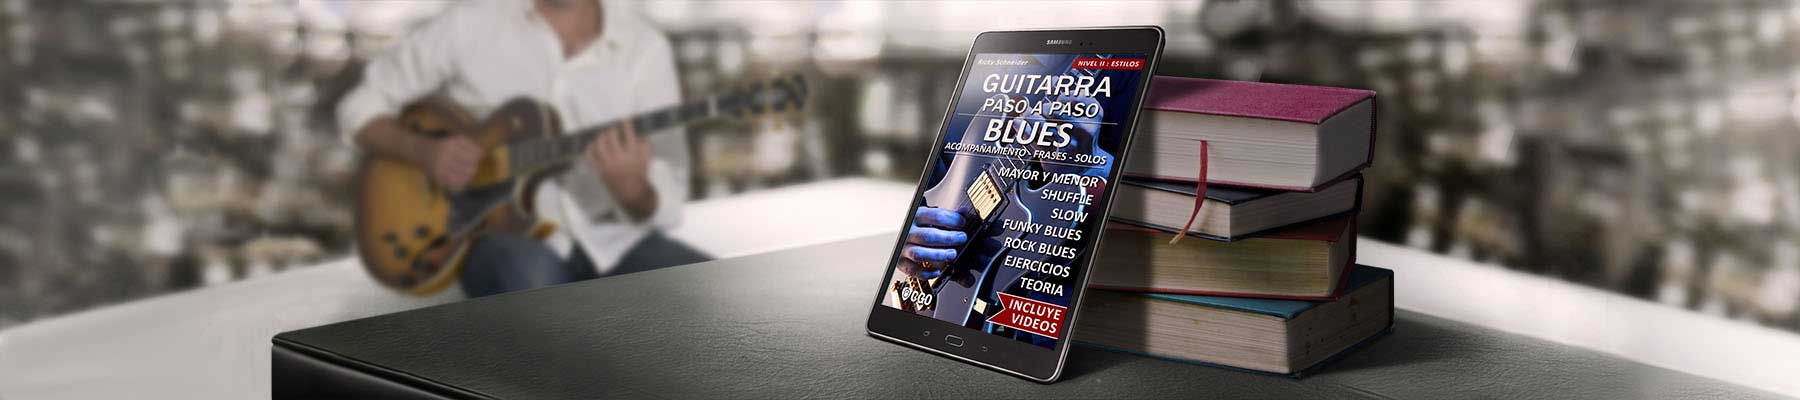 foto-slider-blues-jpg